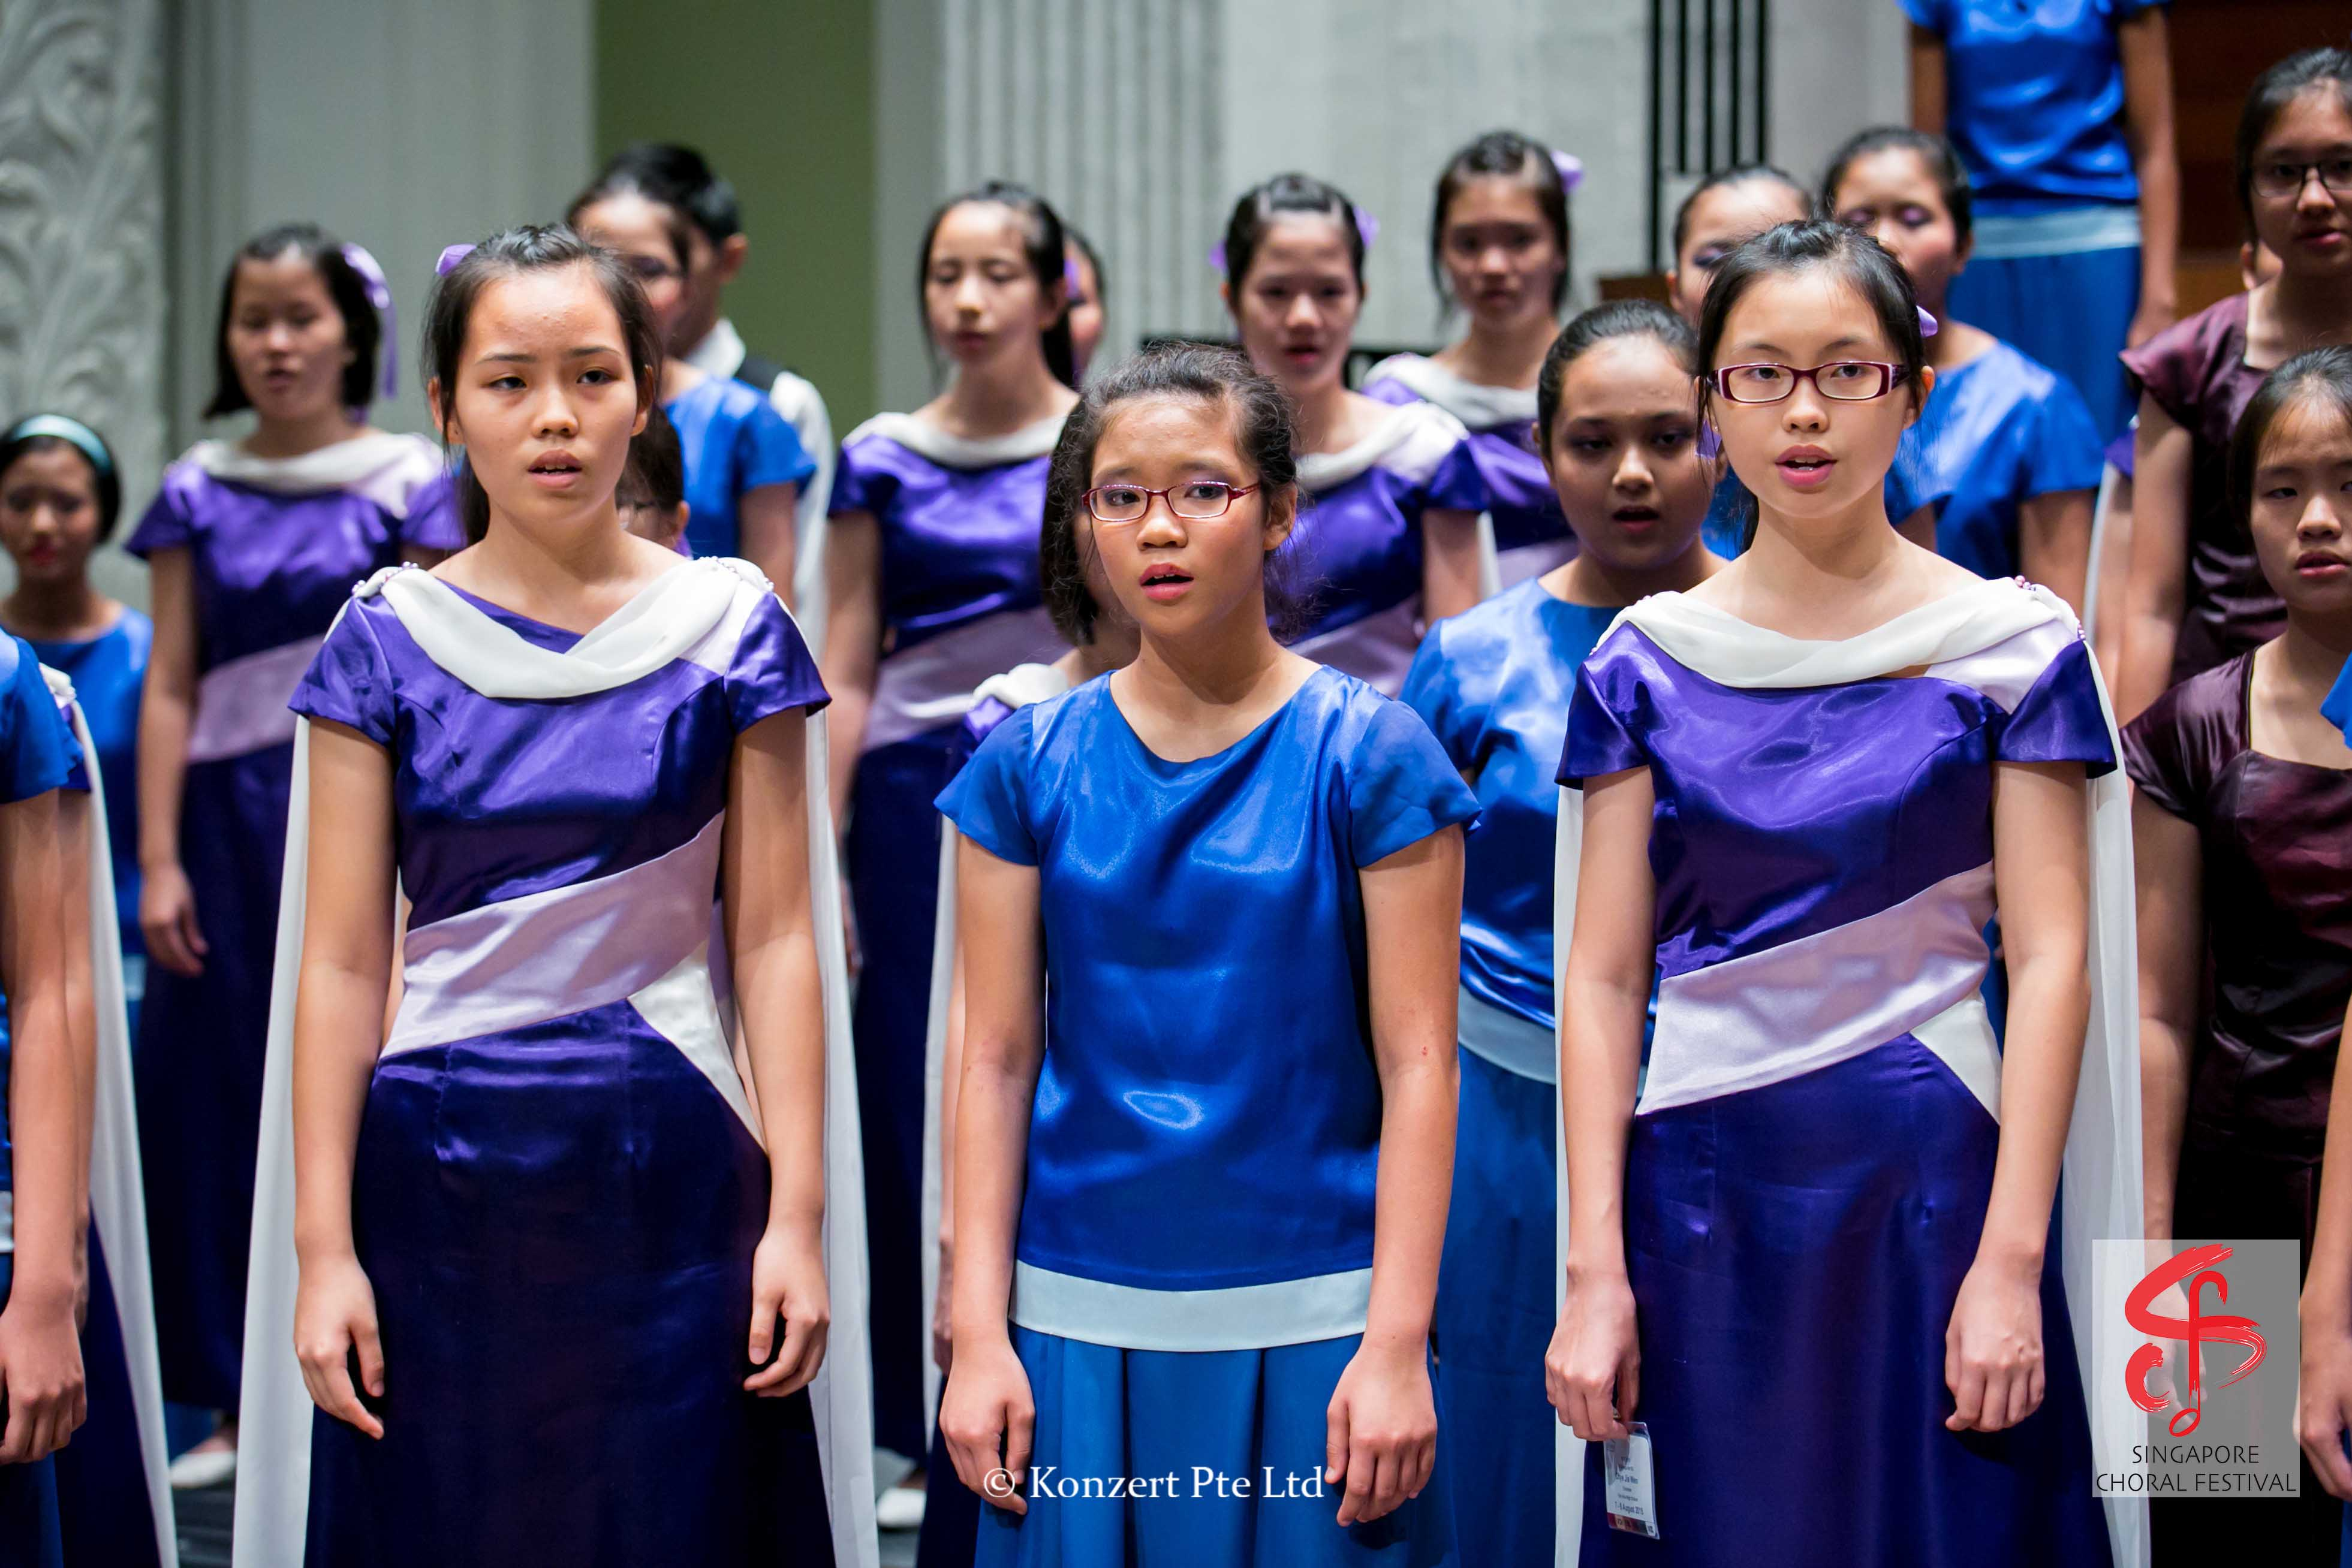 Singapore Choral Festival 7-8-15 (84).jpg